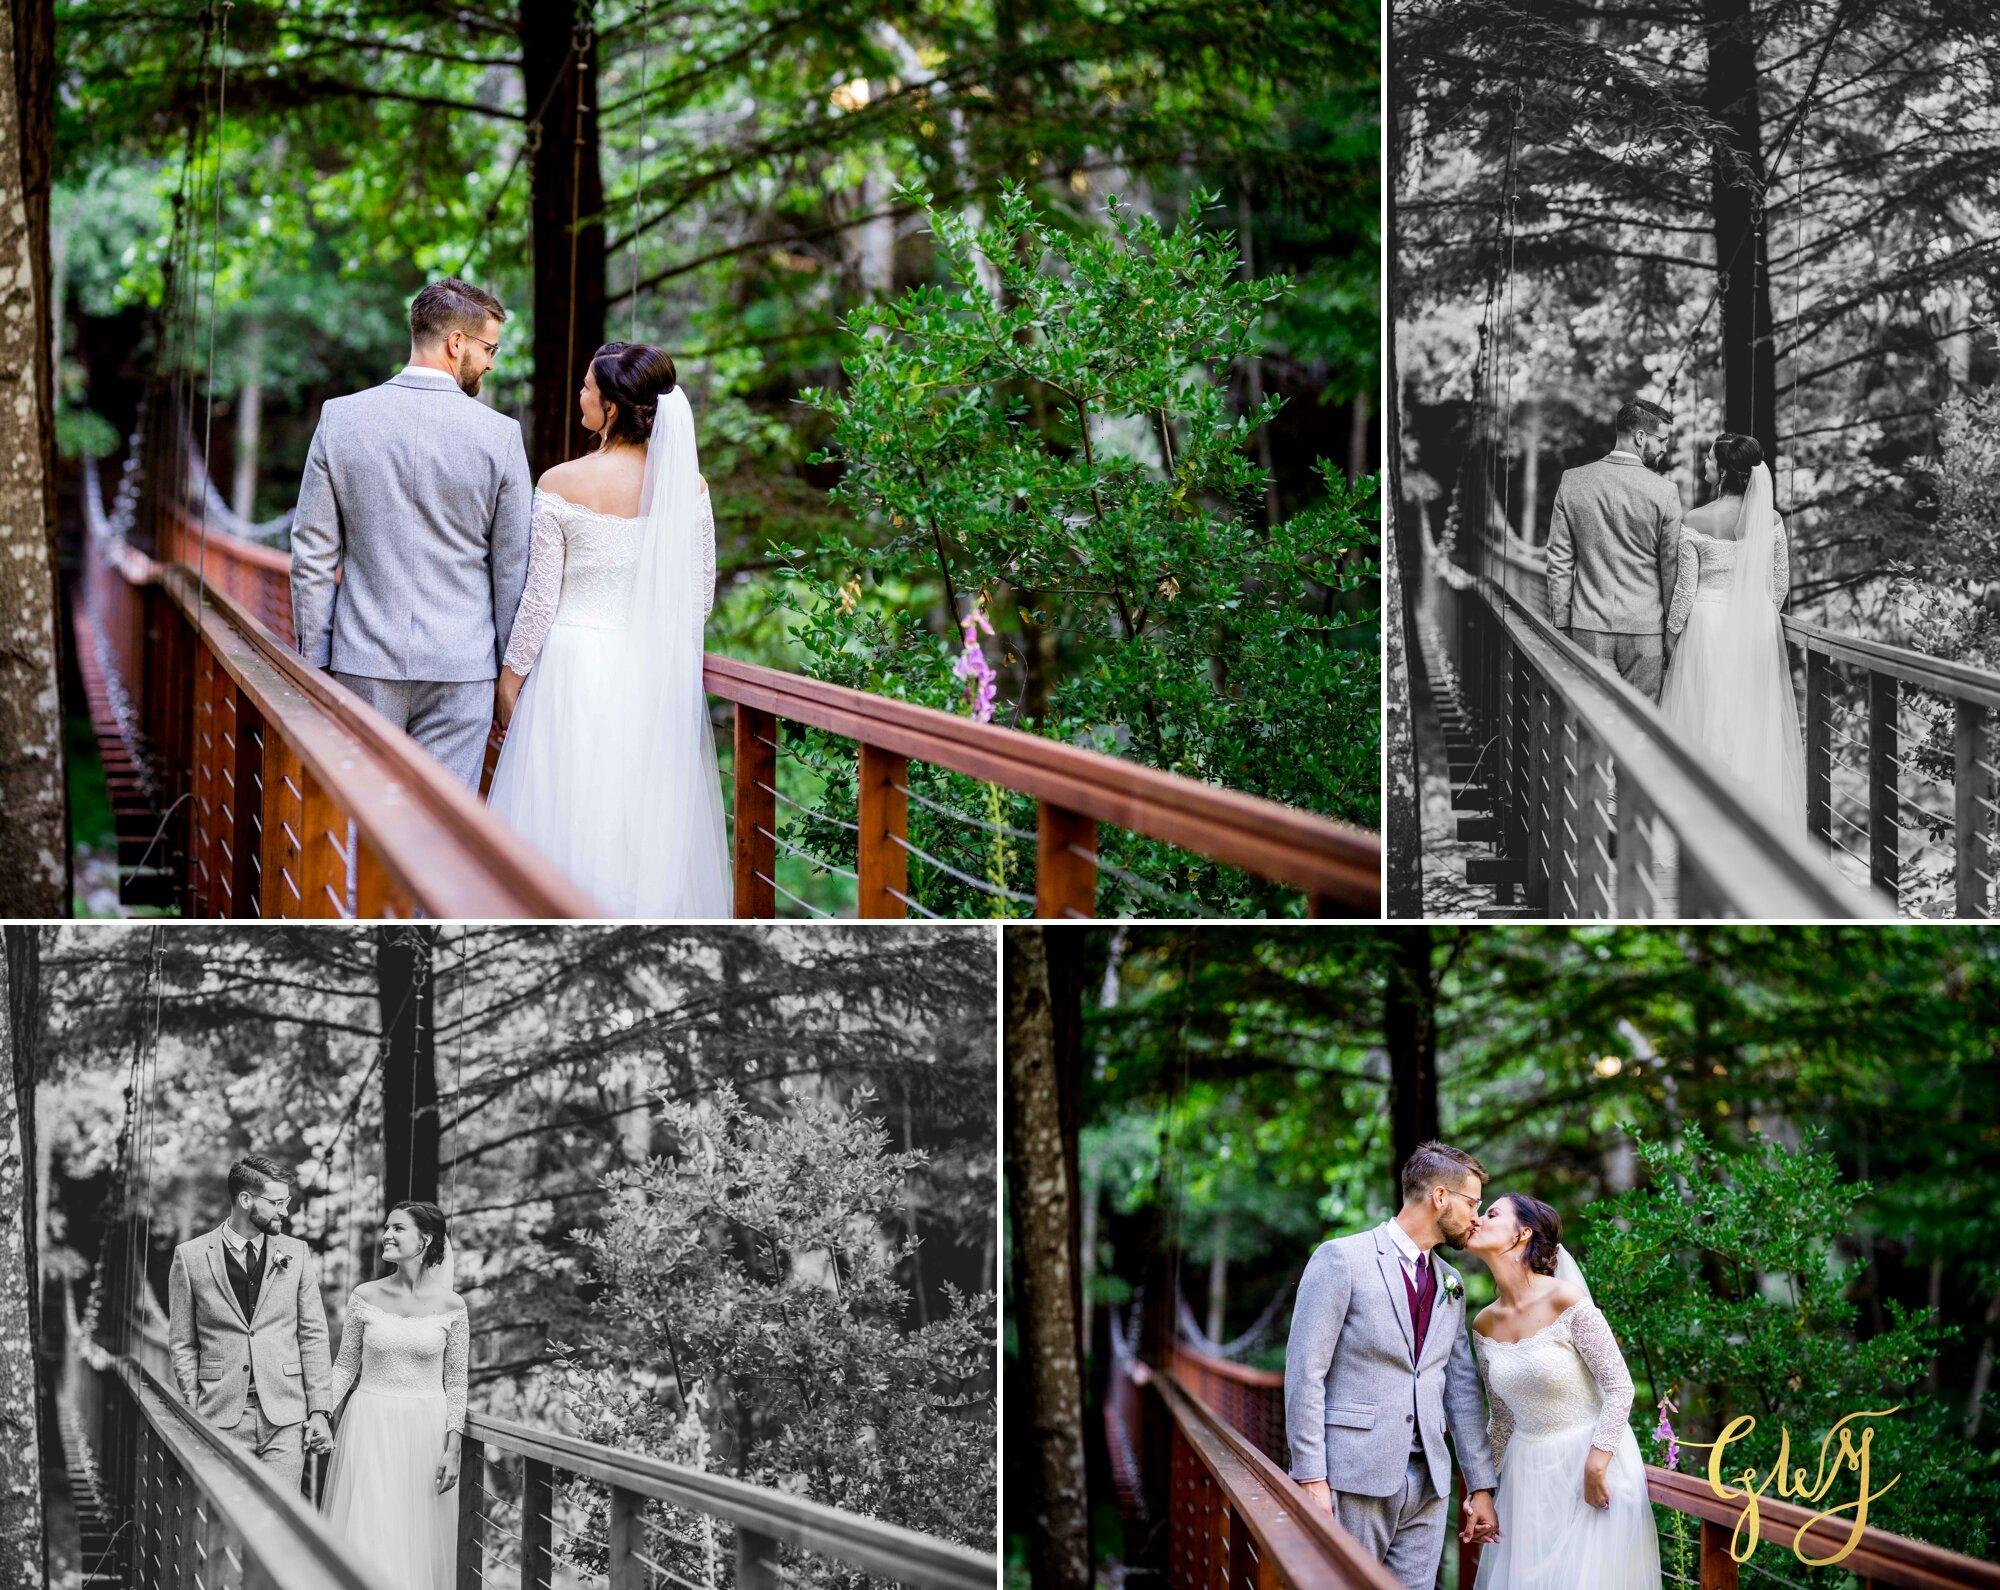 Casey + Jordan's Intimate Big Sur Elopement in the Redwoods by Glass Woods Media - 2 4.jpg